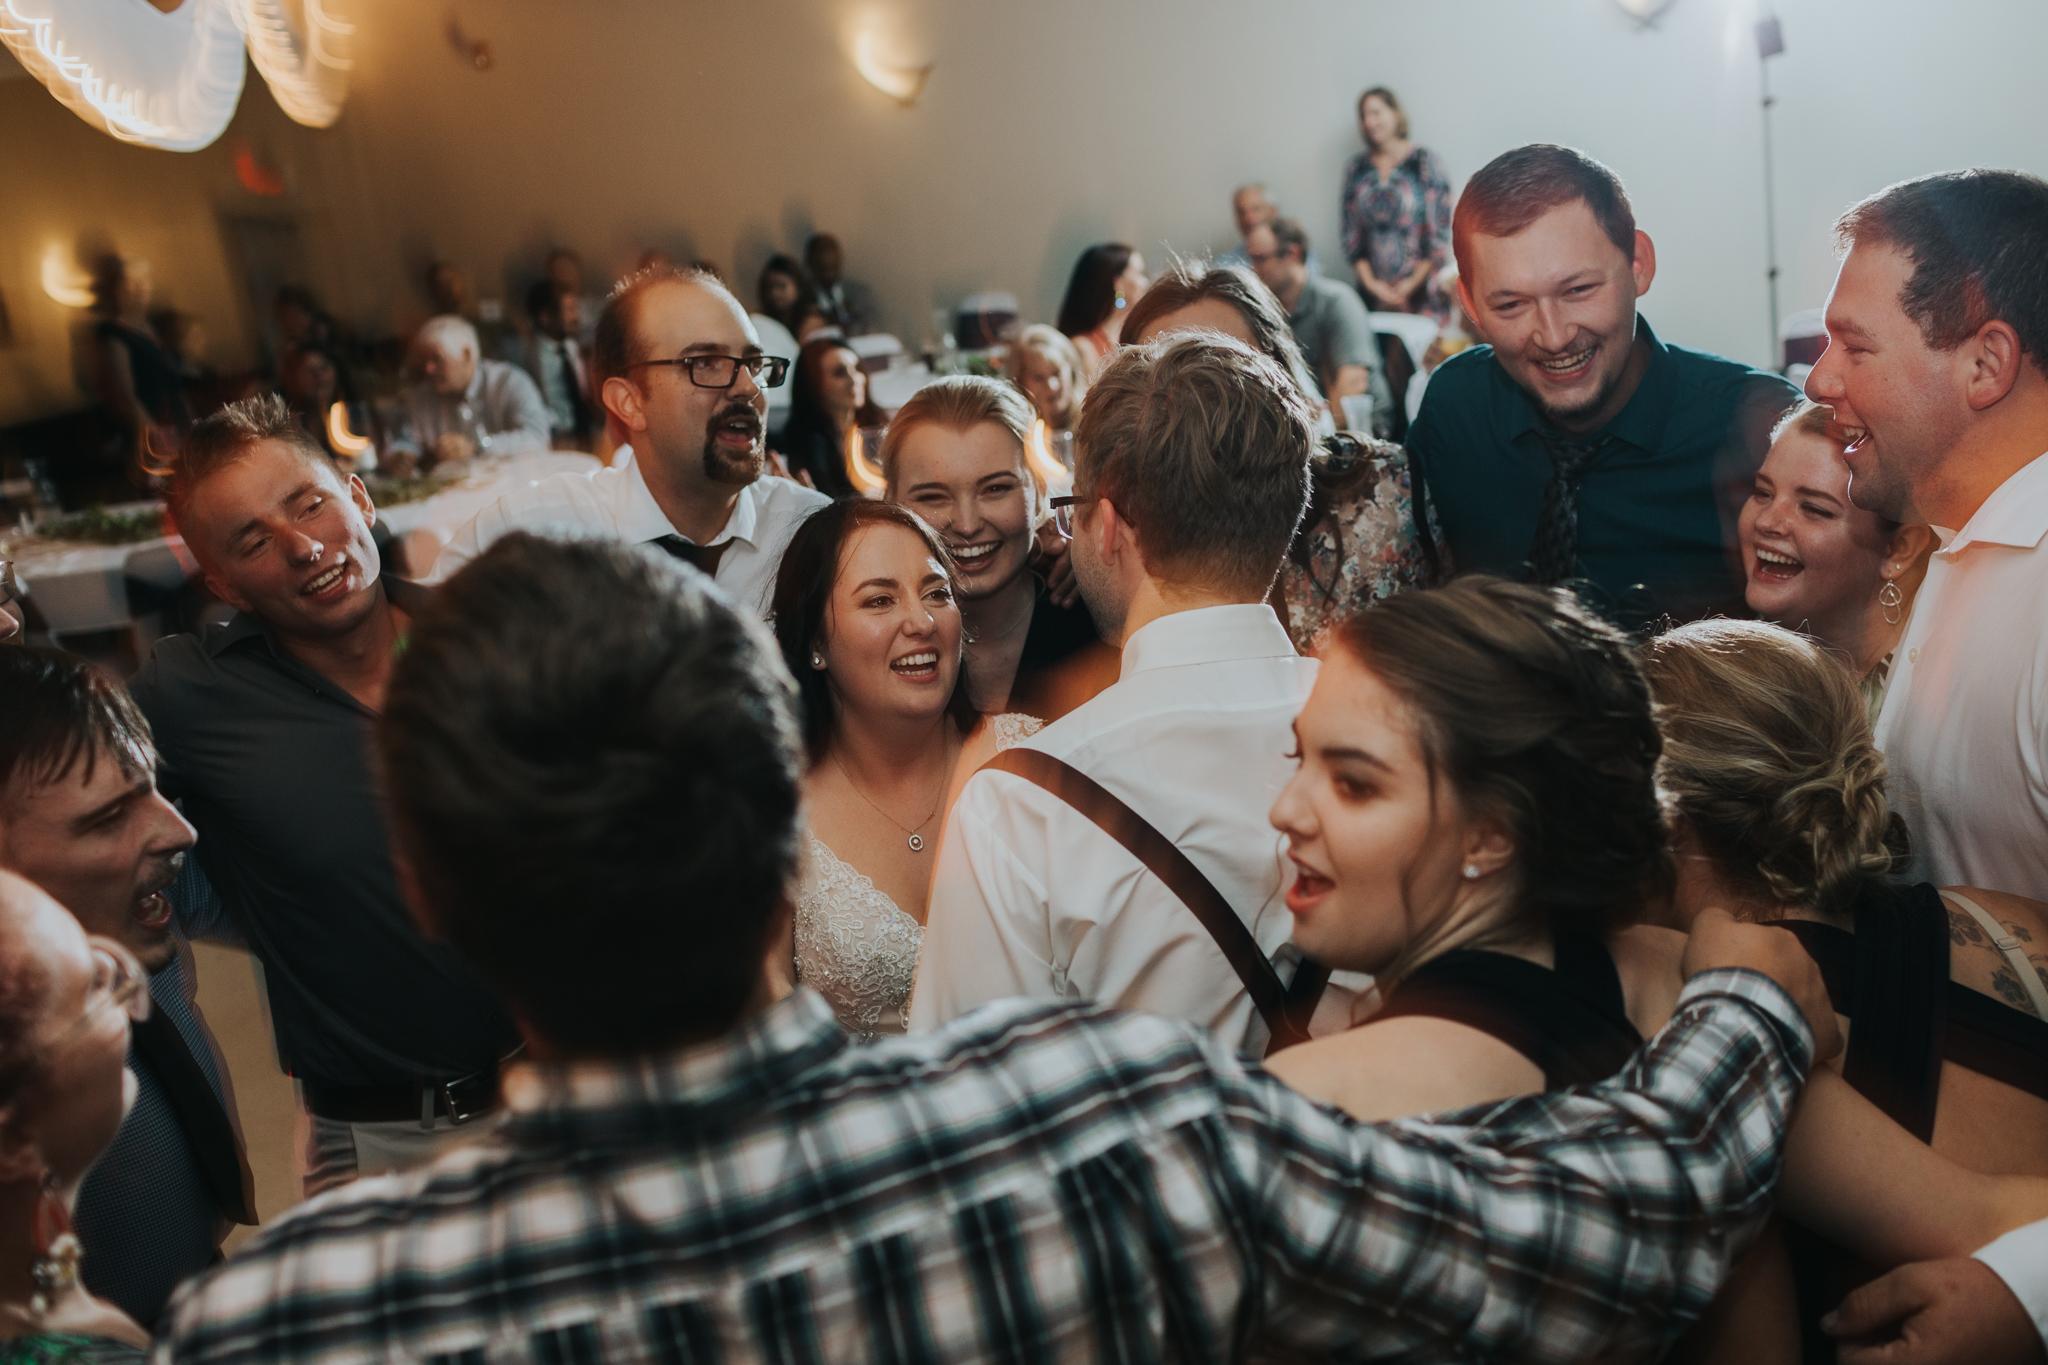 group dancing and singing at wedding reception